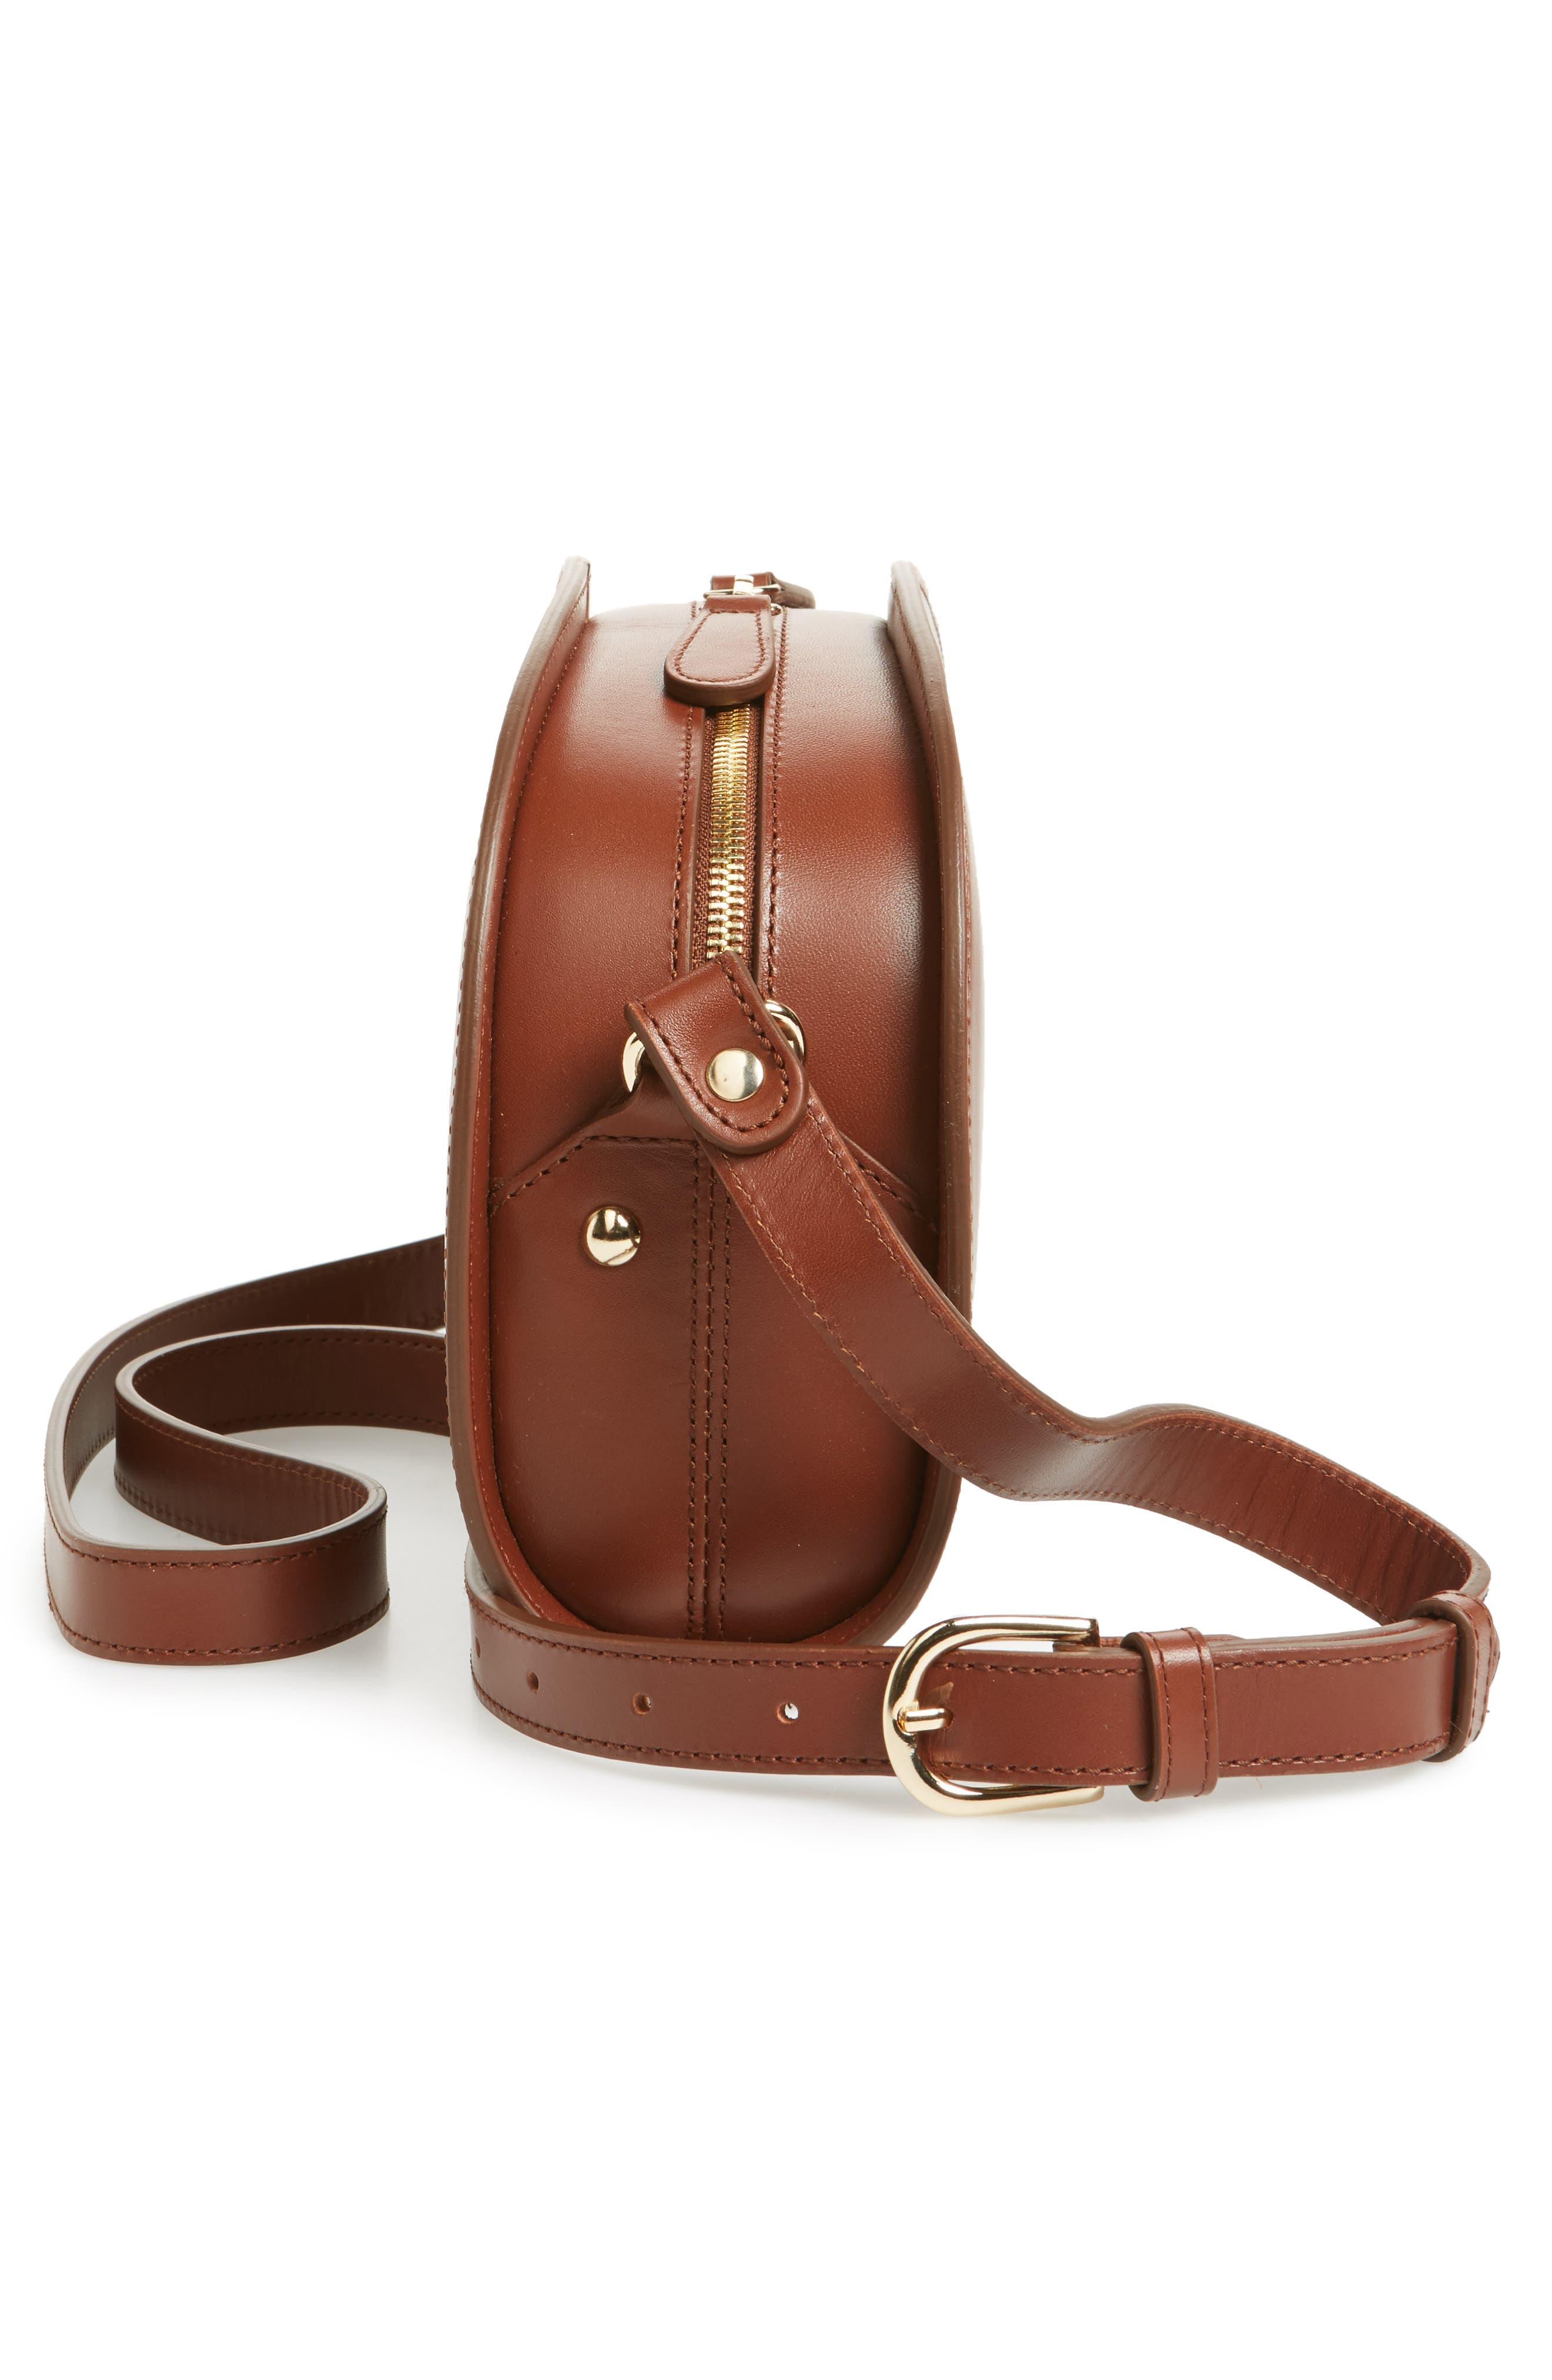 'Sac Demi Lune' Leather Crossbody Bag,                             Alternate thumbnail 5, color,                             NOISETTE